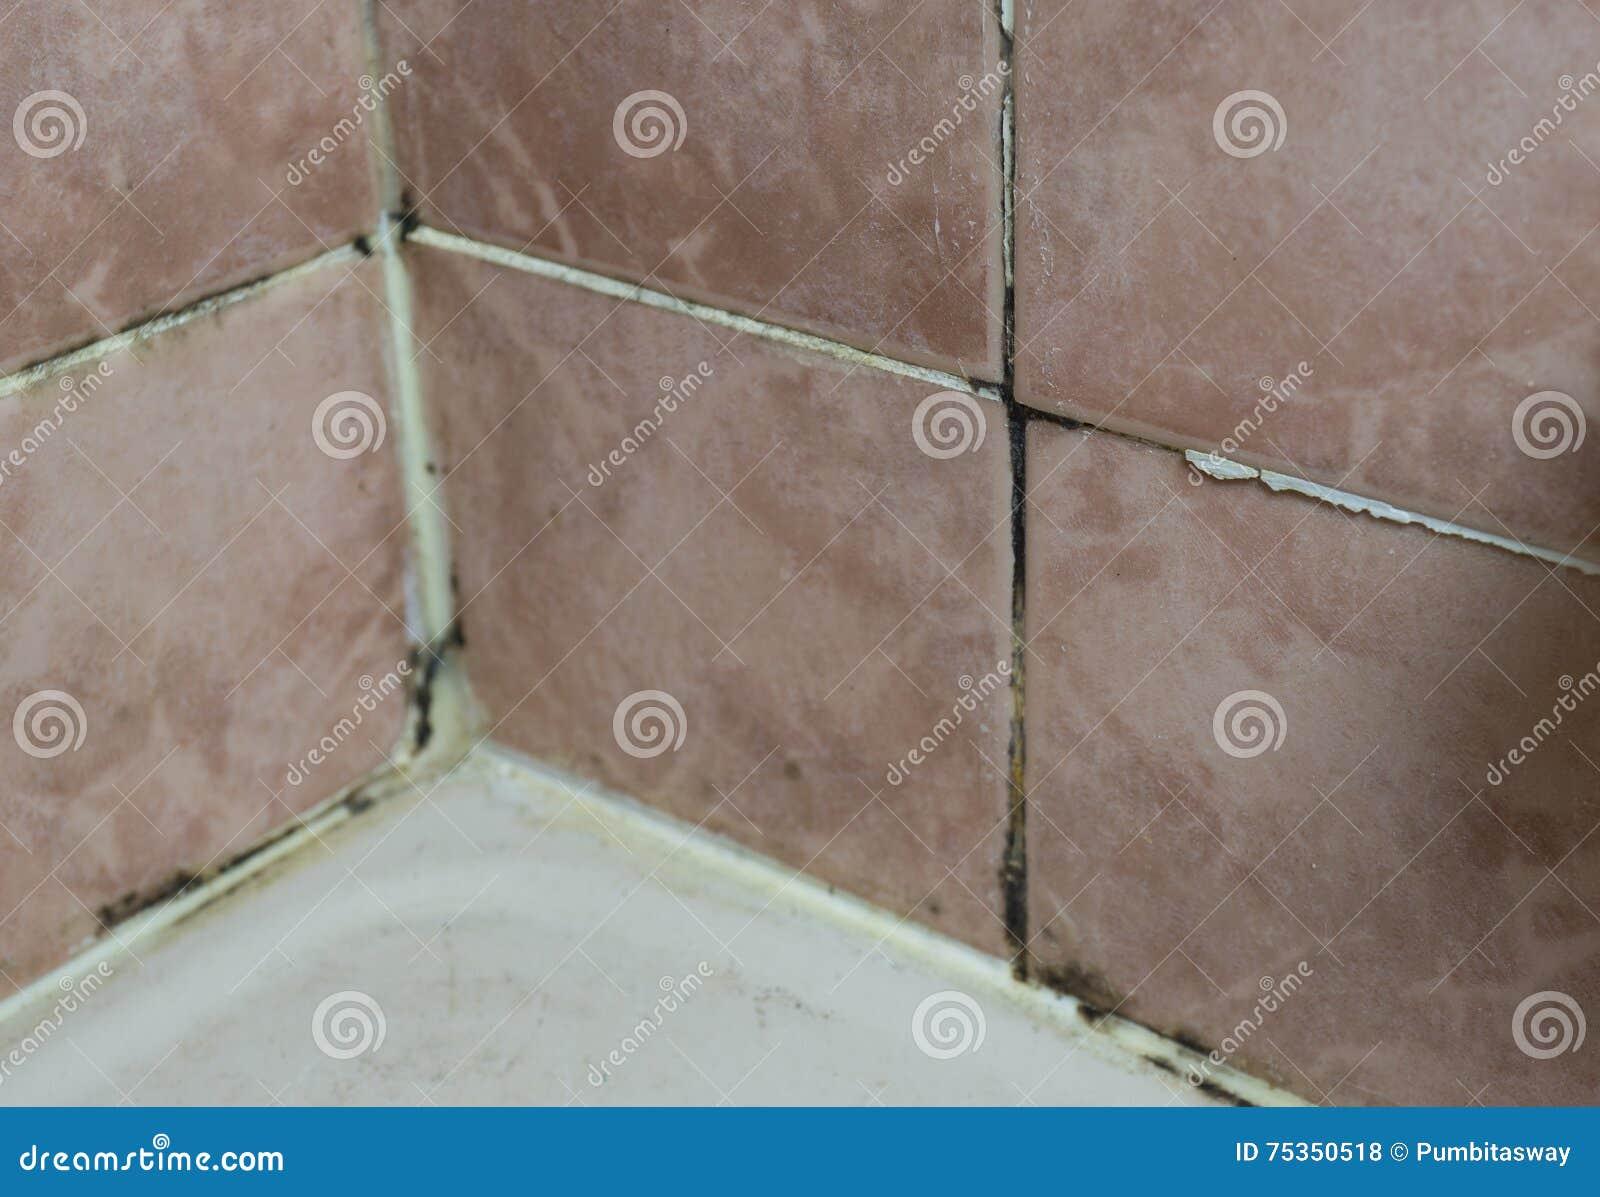 Fungus growing on tile joints bathroom wall corner stock photo royalty free stock photo download fungus growing on tile dailygadgetfo Images